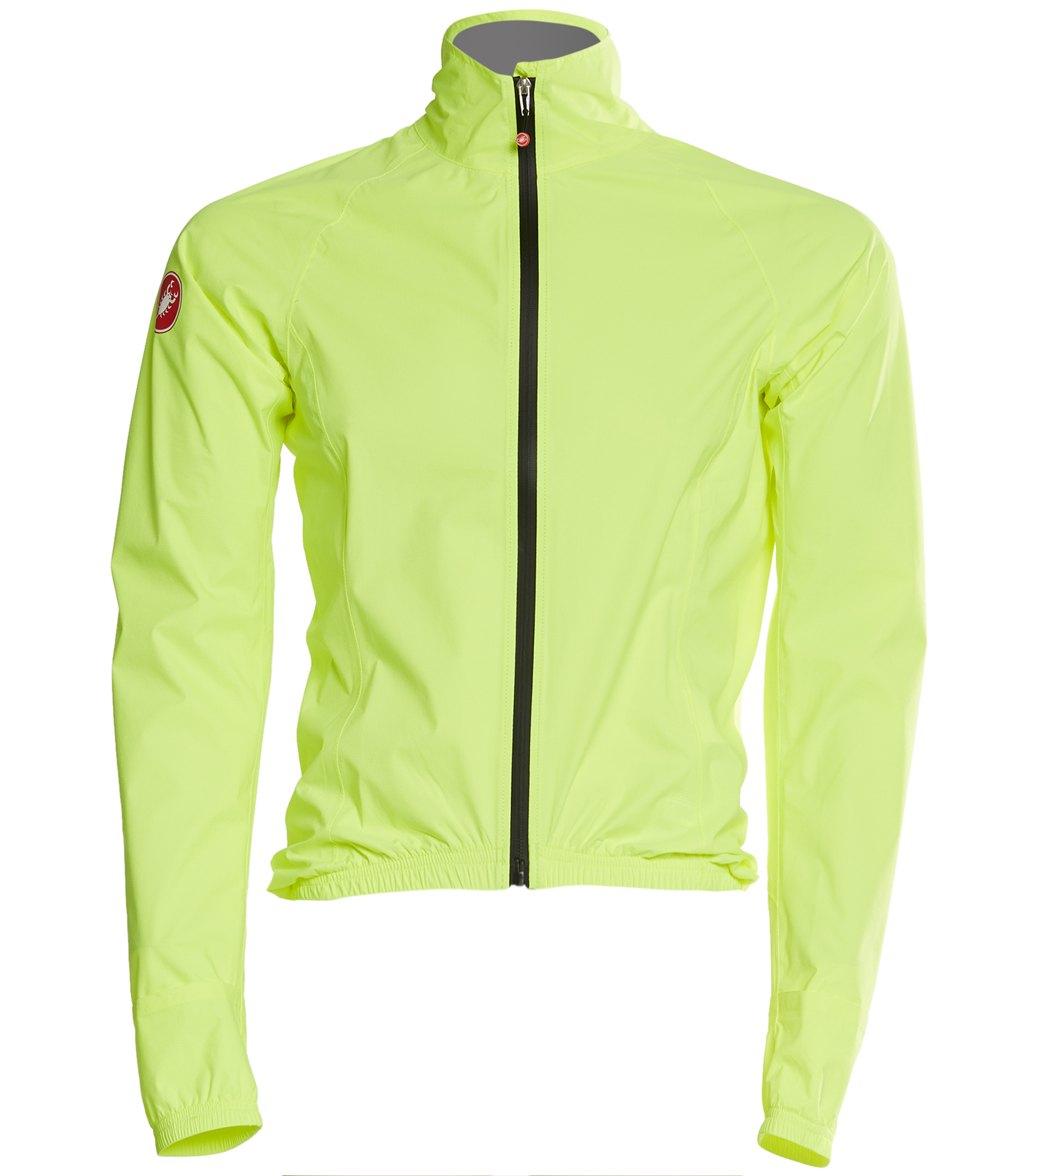 d3b2fa557 Castelli Men's Emergency Rain Jacket